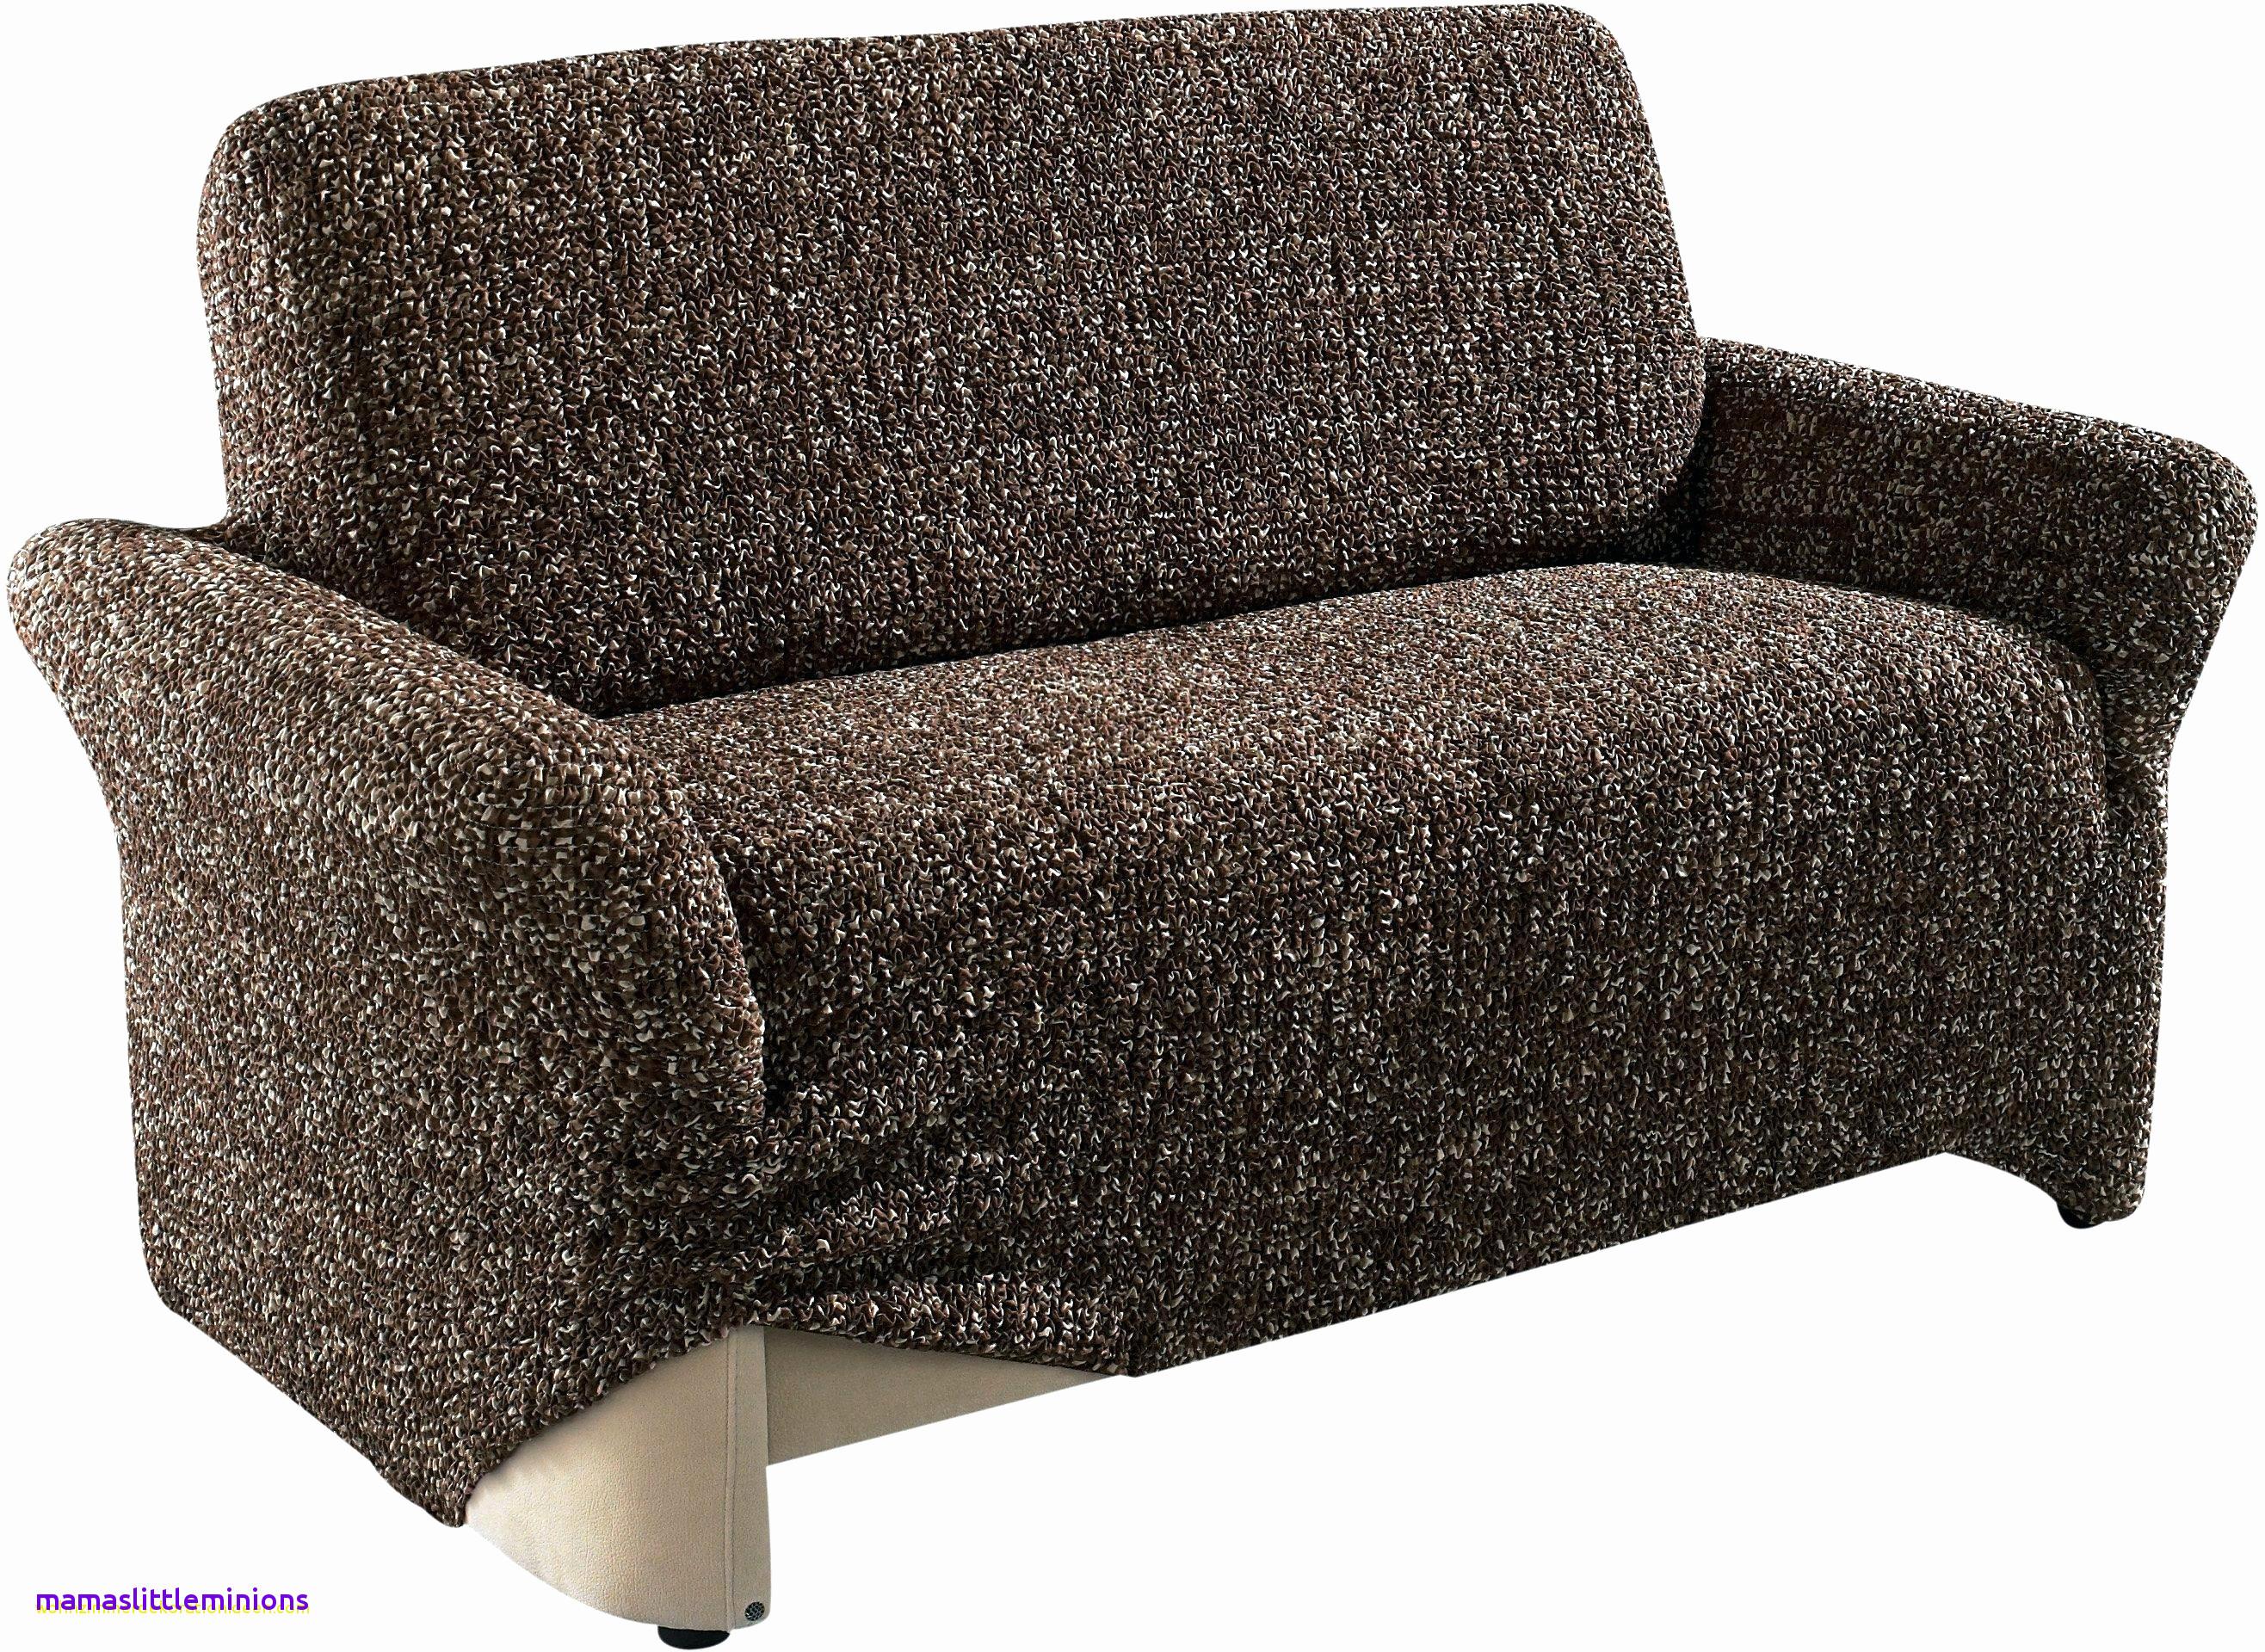 Ikea Ektorp 3 Places Beau Images Ikea Wohnzimmer Ektorp Durchgehend sofa Grau Ikea top Ergebnis sofa